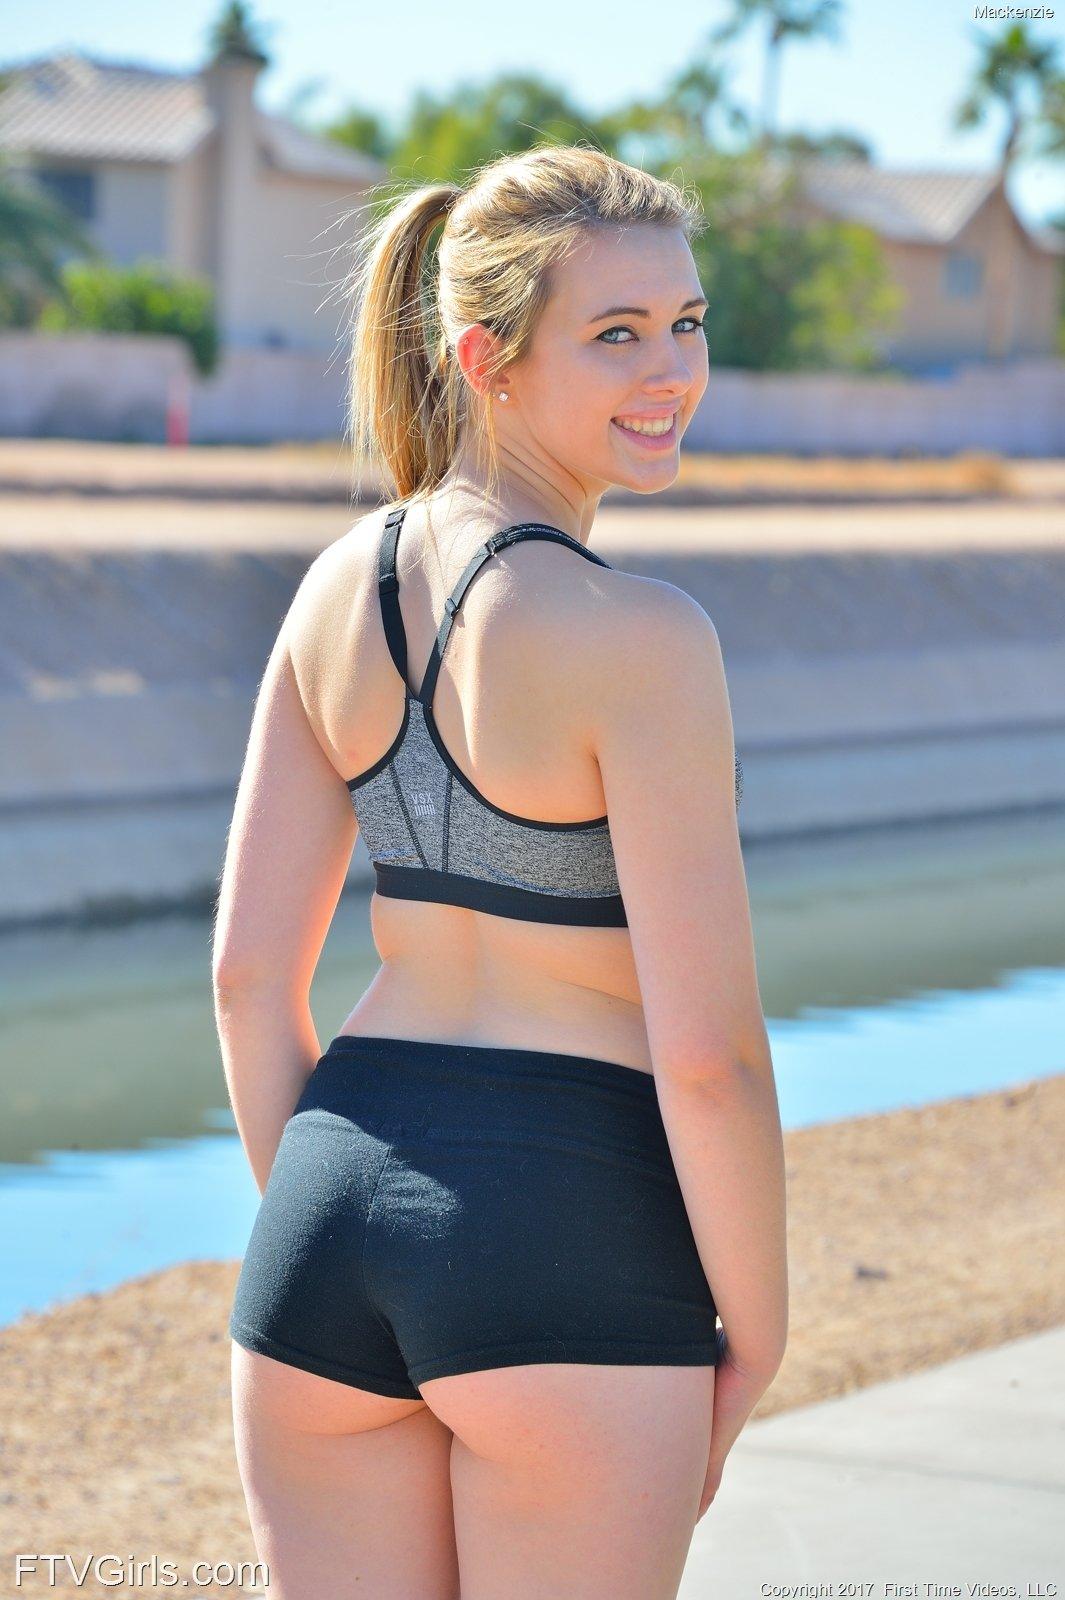 Mackenzie Ann In Sporty Girl Penetrates Big By Ftv Girls -2204